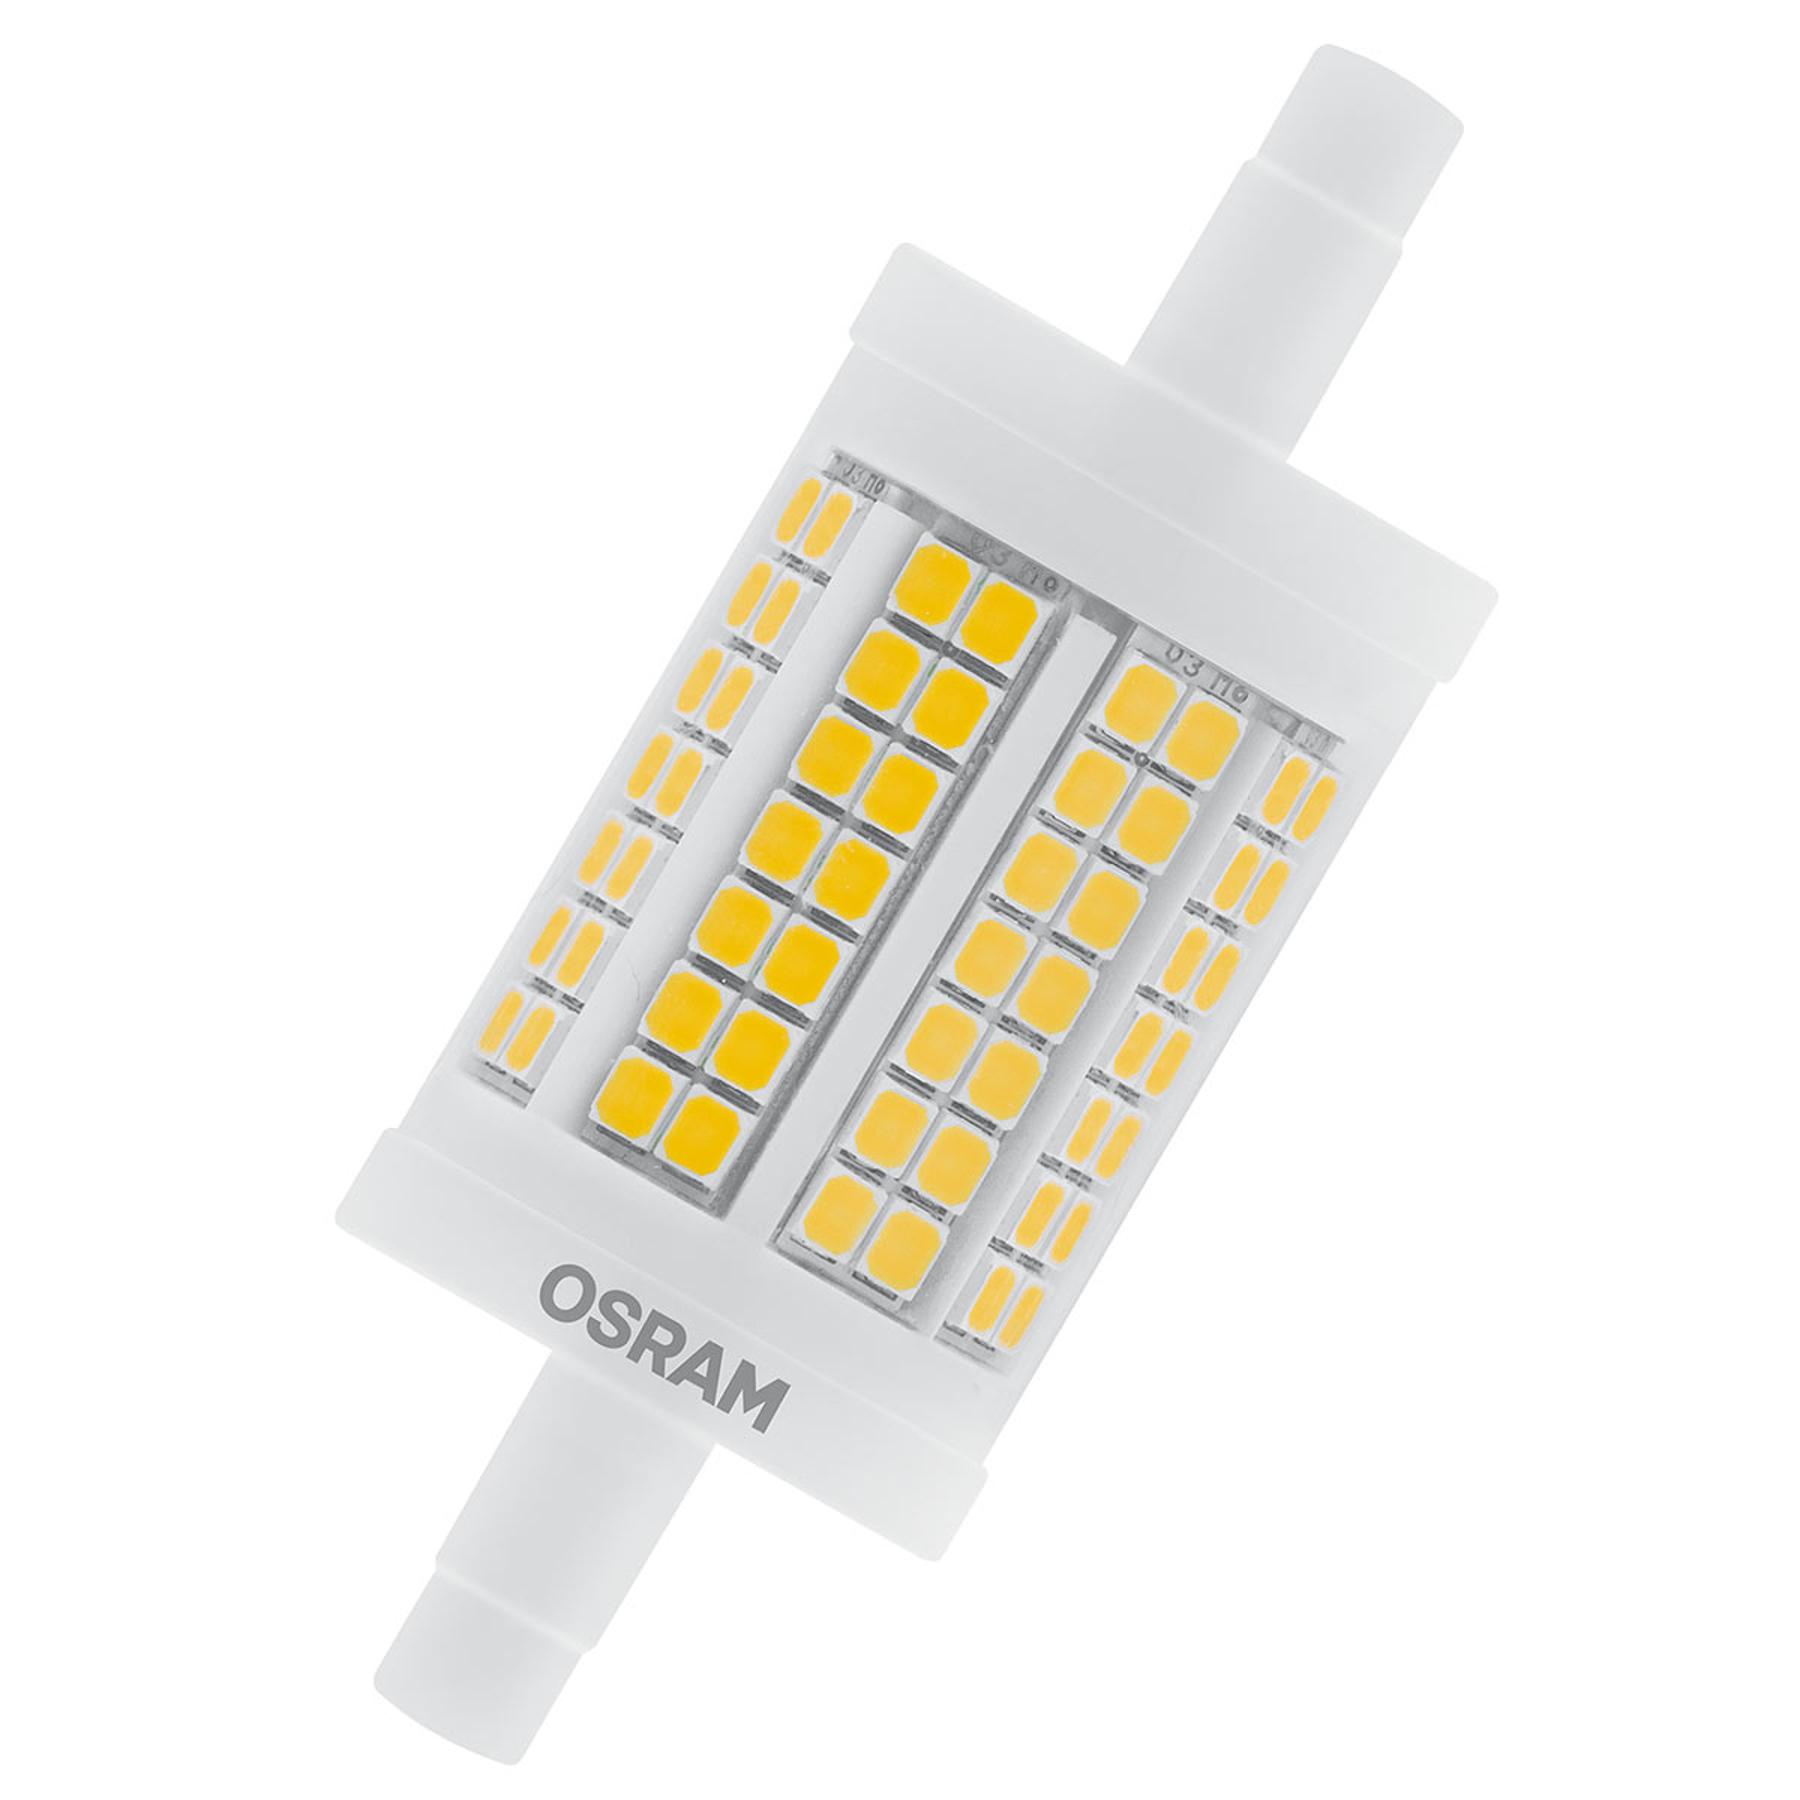 OSRAM LED-Stablampe R7s 11,5W 7,8cm 827 dimmbar